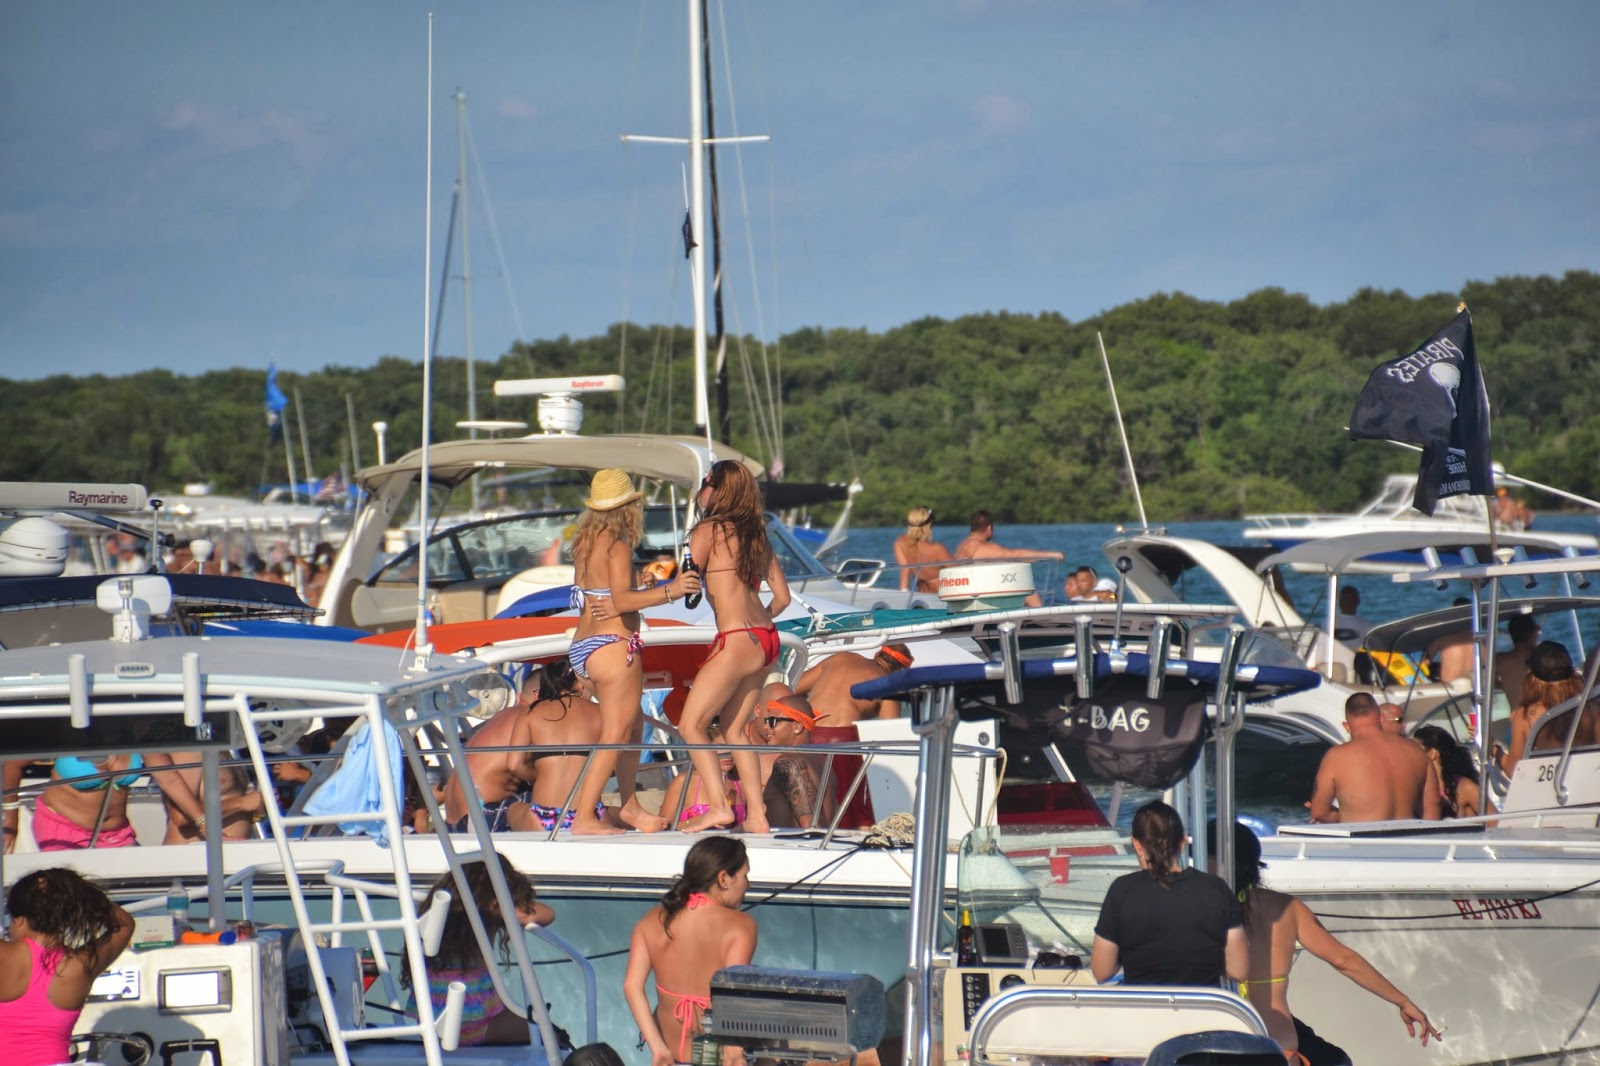 Columbus day regatta miami nude what phrase